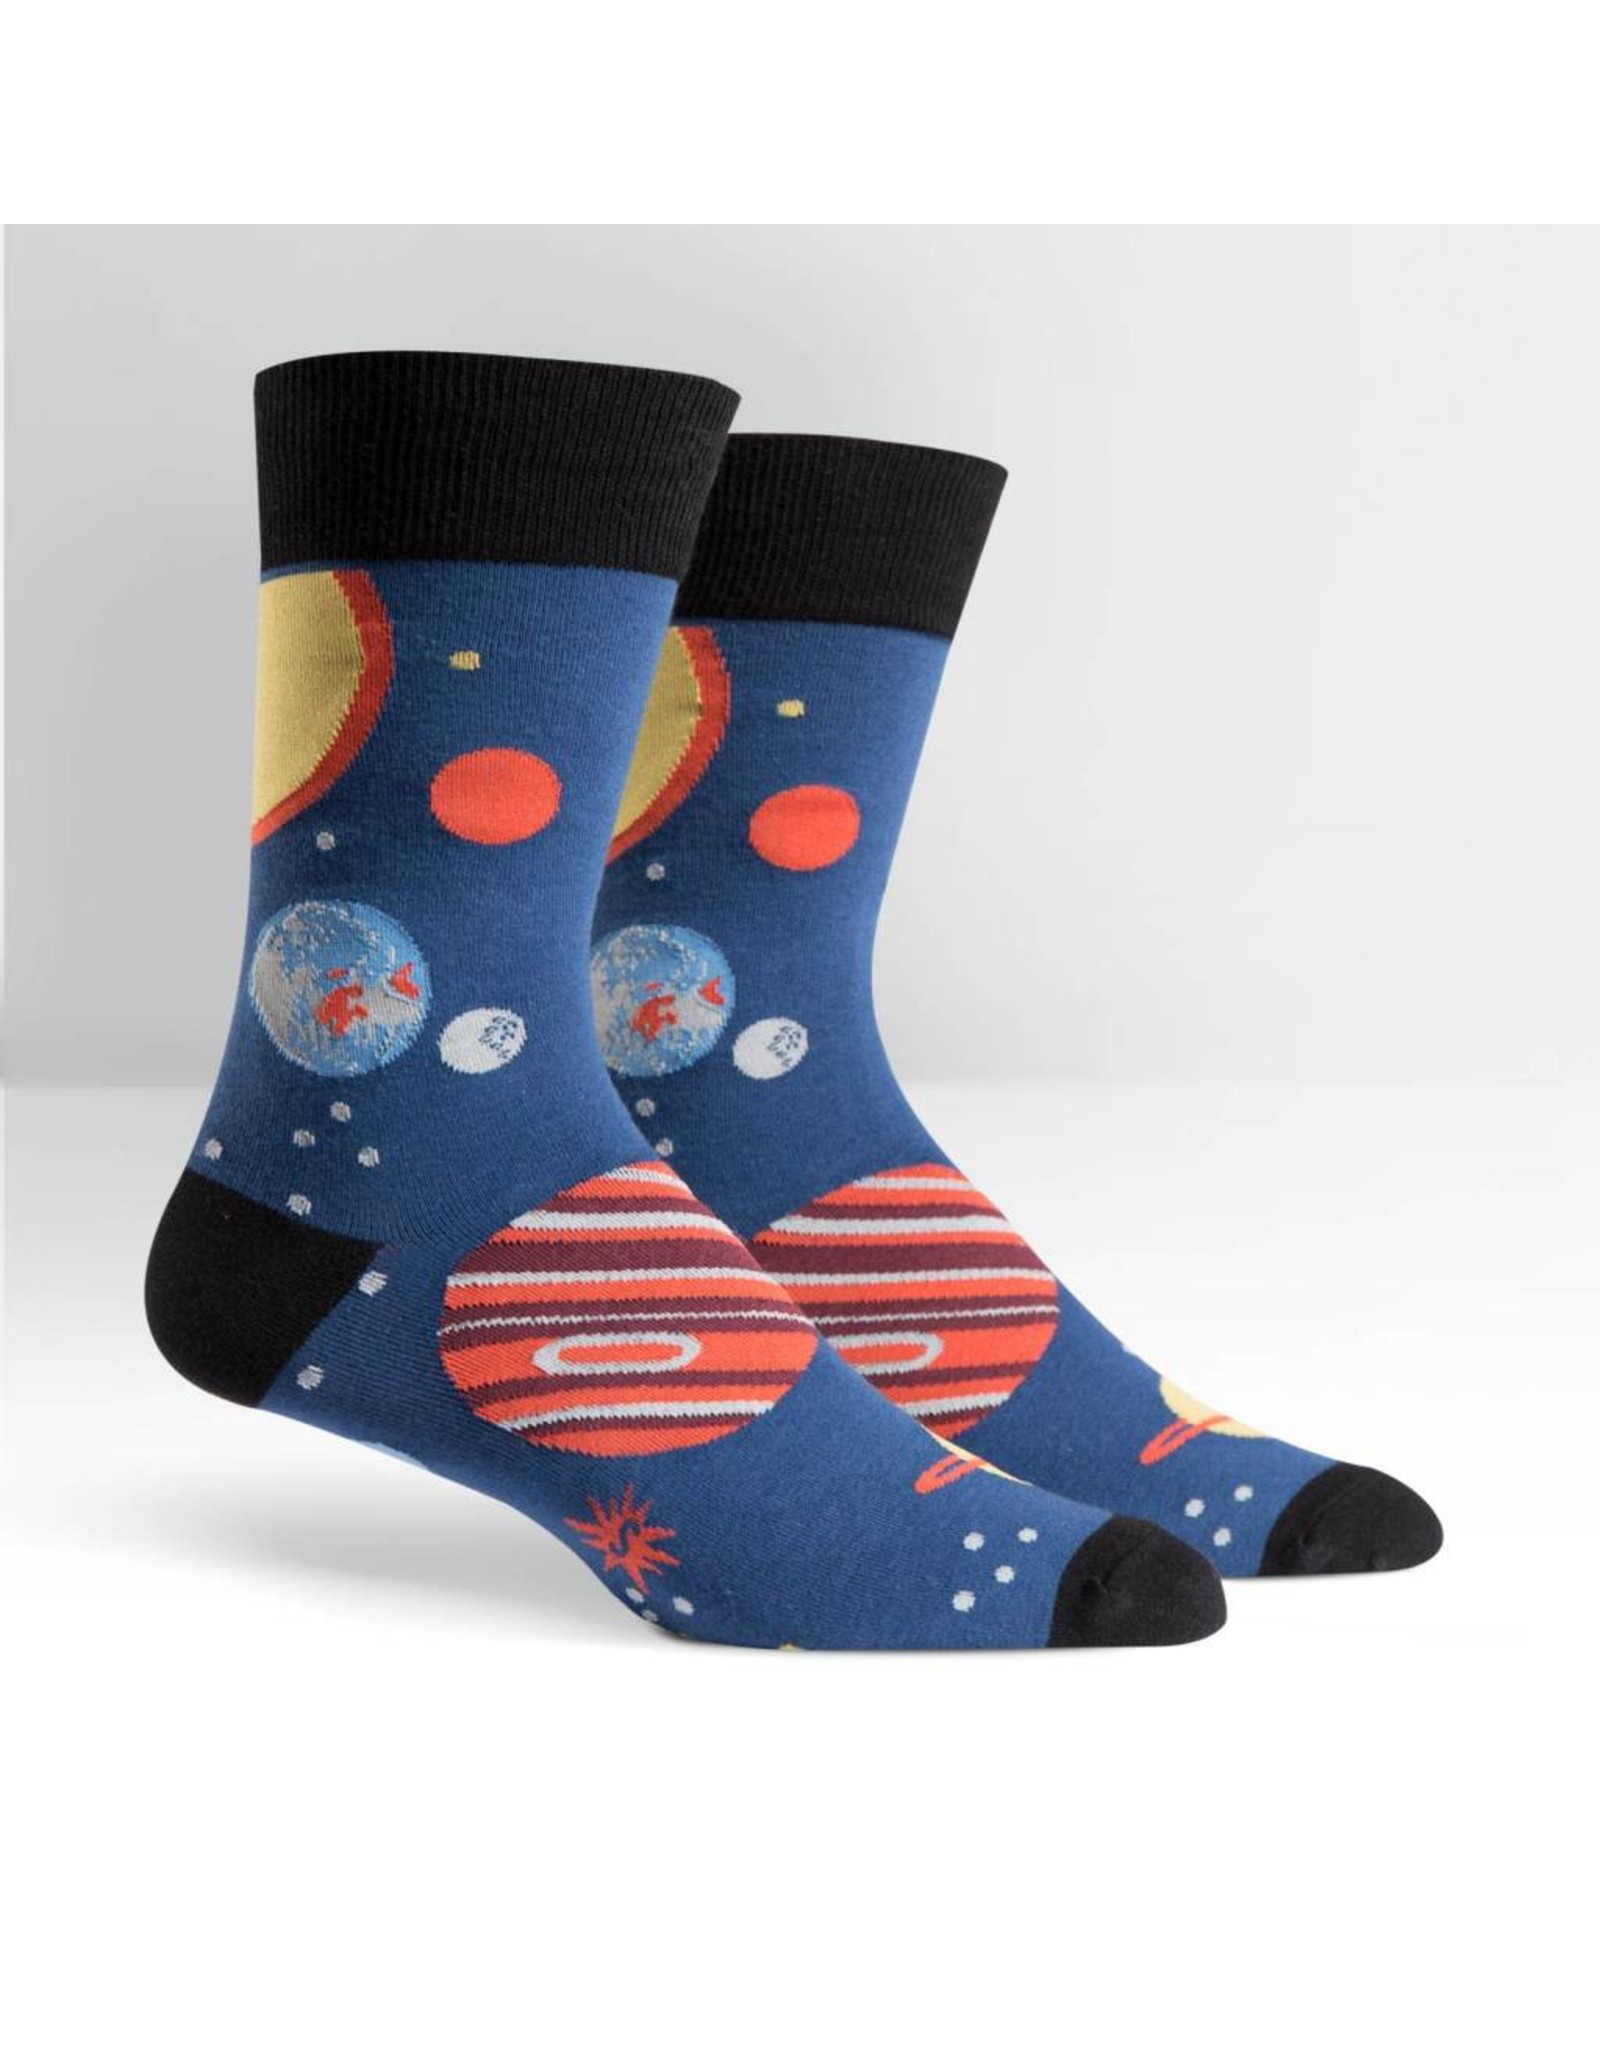 SOCK IT TO ME - Men's Planets Crew Socks